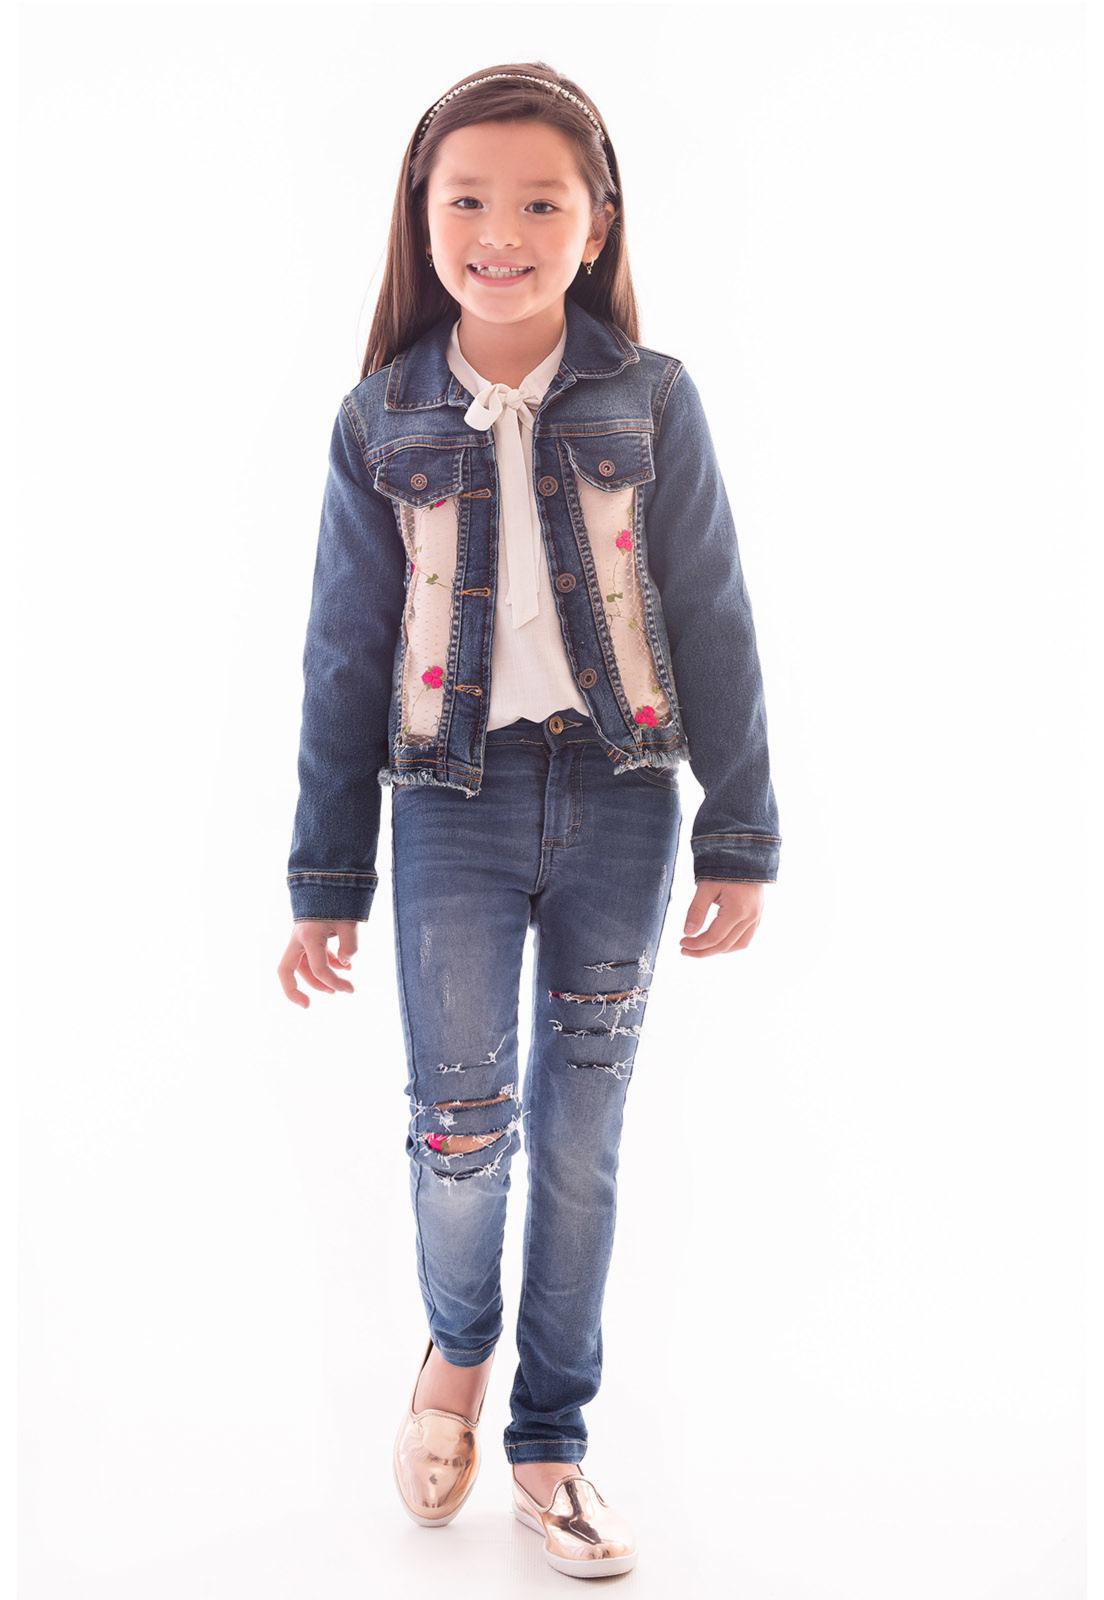 Jaqueta Jeans com Elastano Renda Bordada Ref. 478